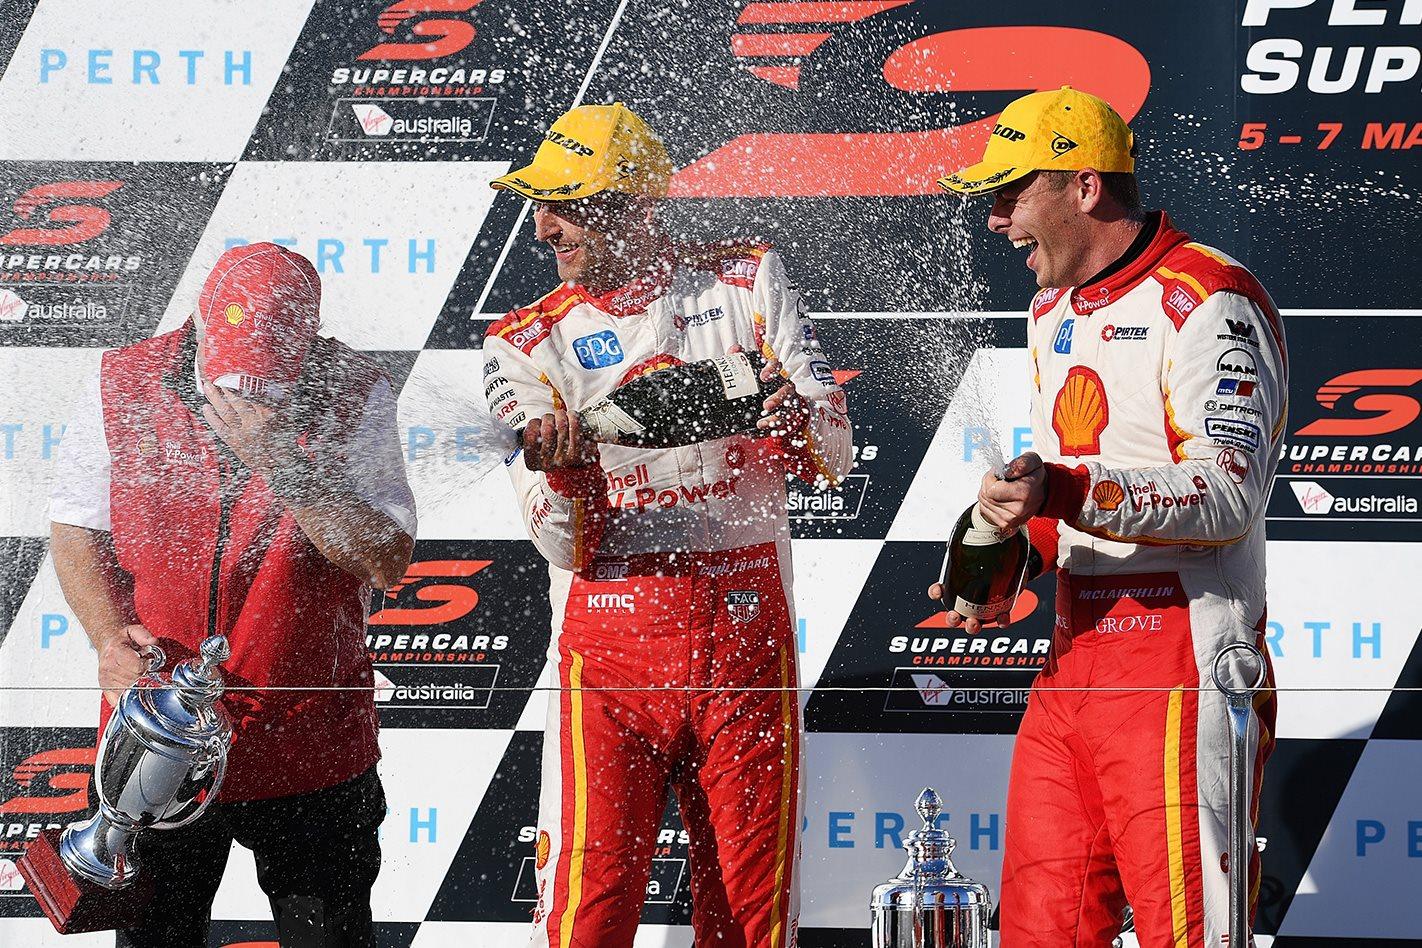 DJR Team Penske wins Perth SuperSprint